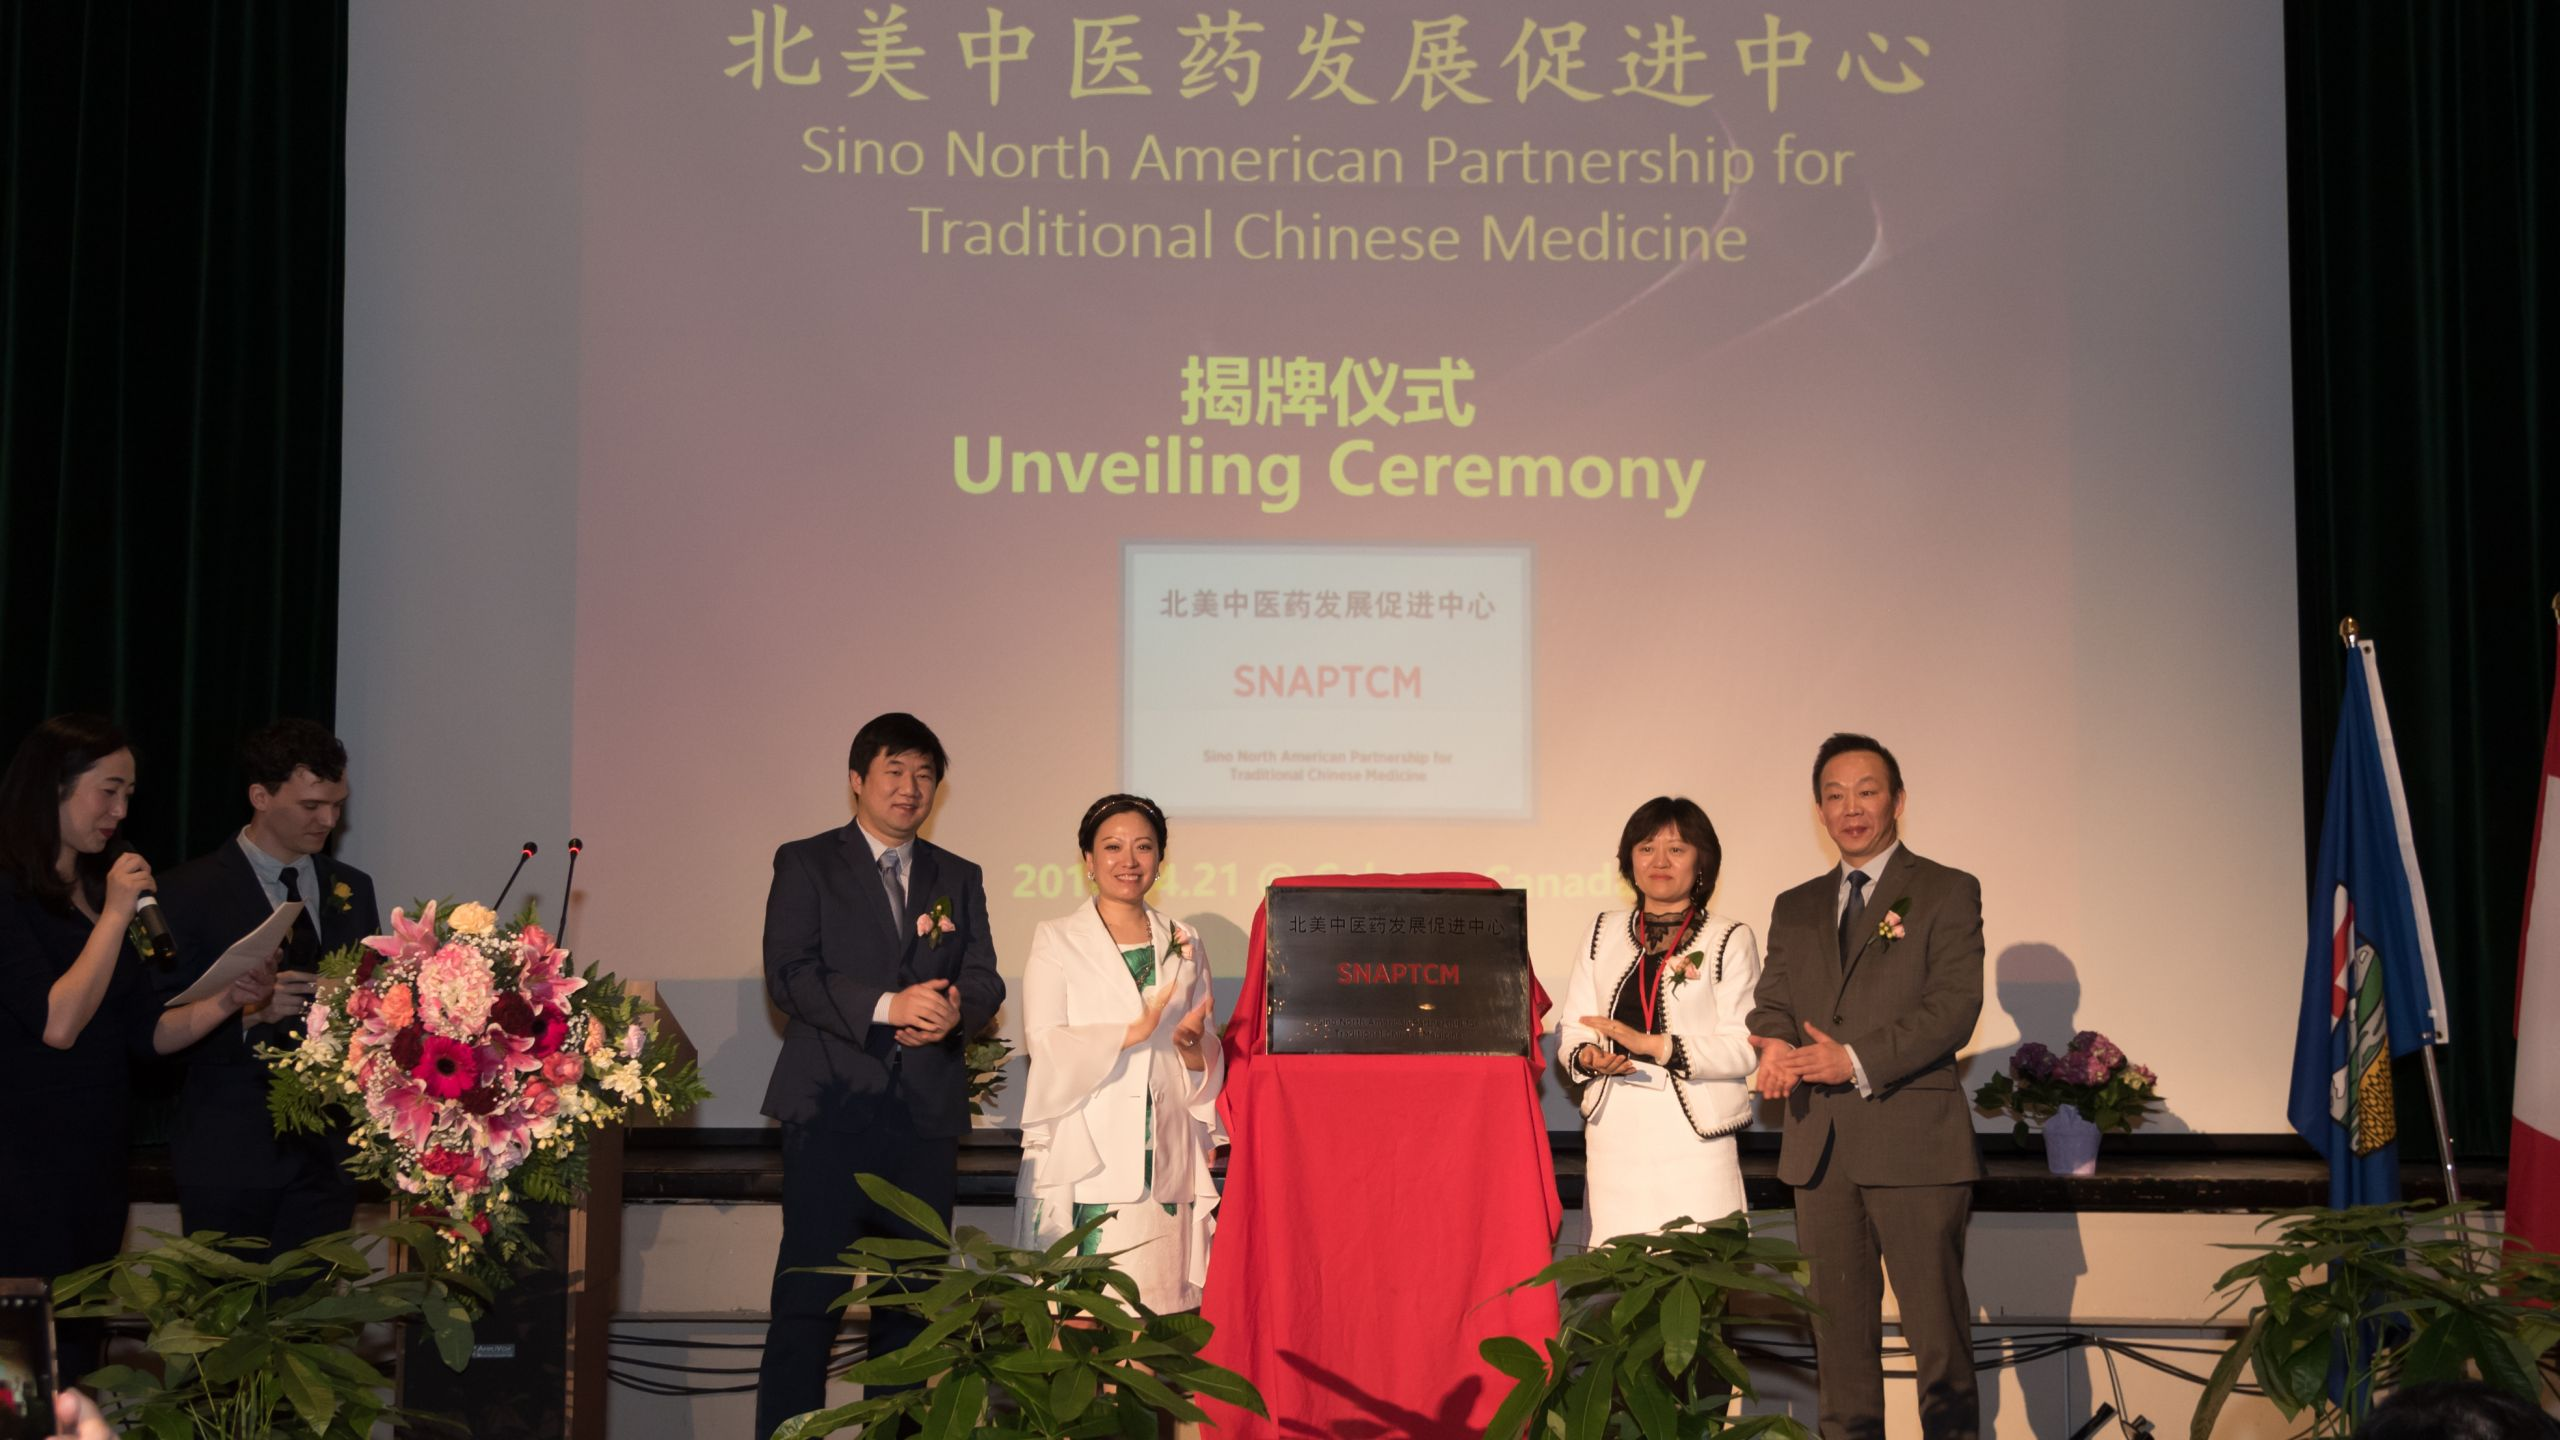 SNAPTCM Unveiling Ceremony